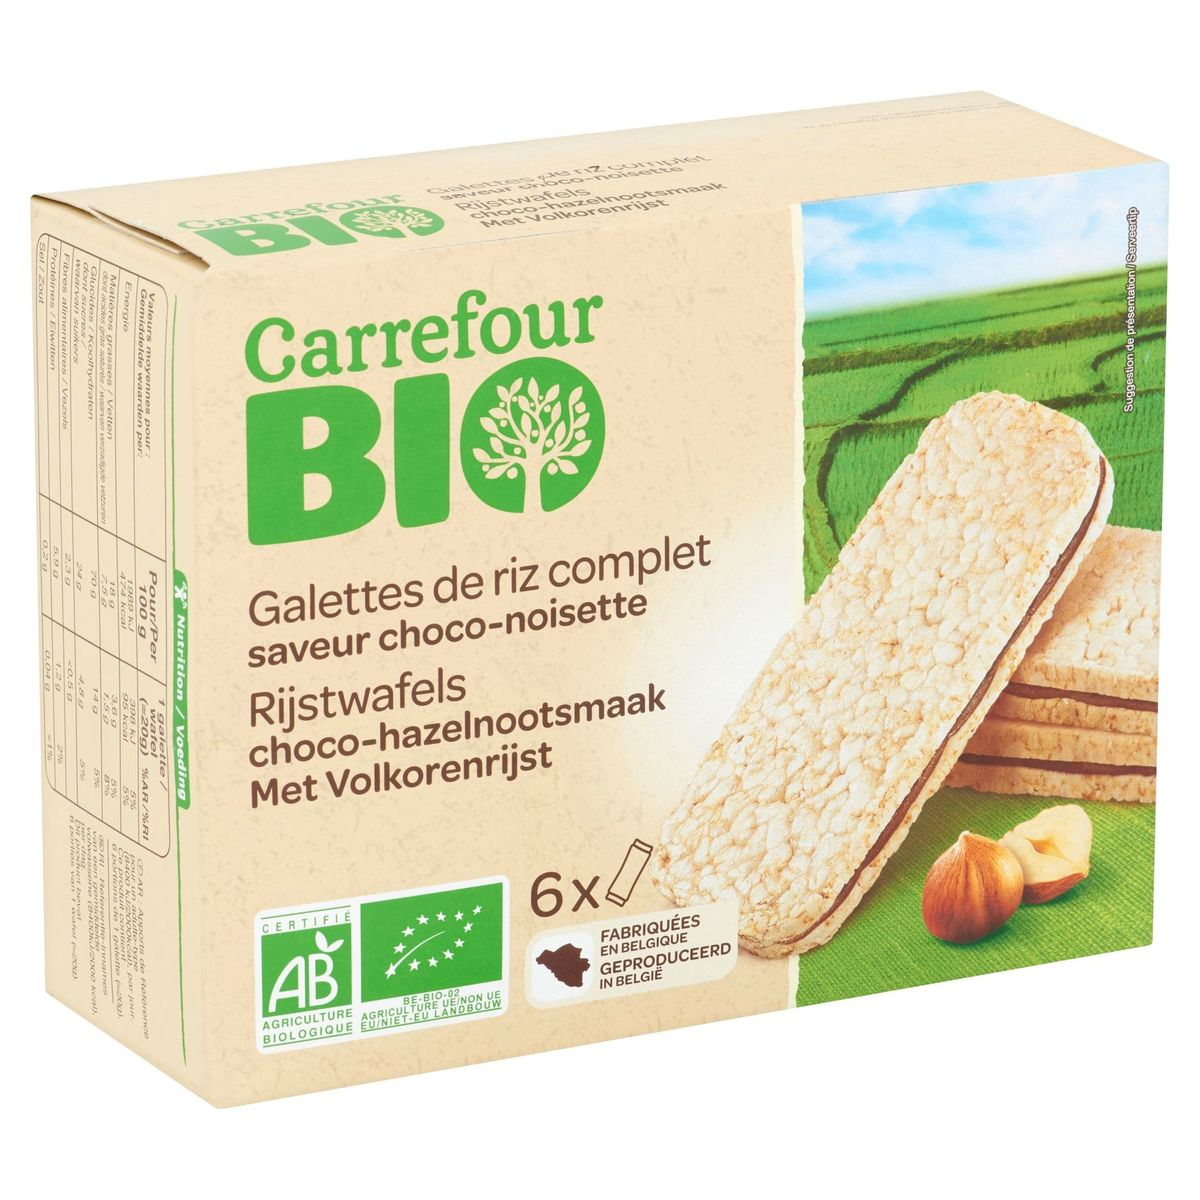 Carrefour Bio Rijstwafels Choco-Hazelnootsmaak 6 x 20 g